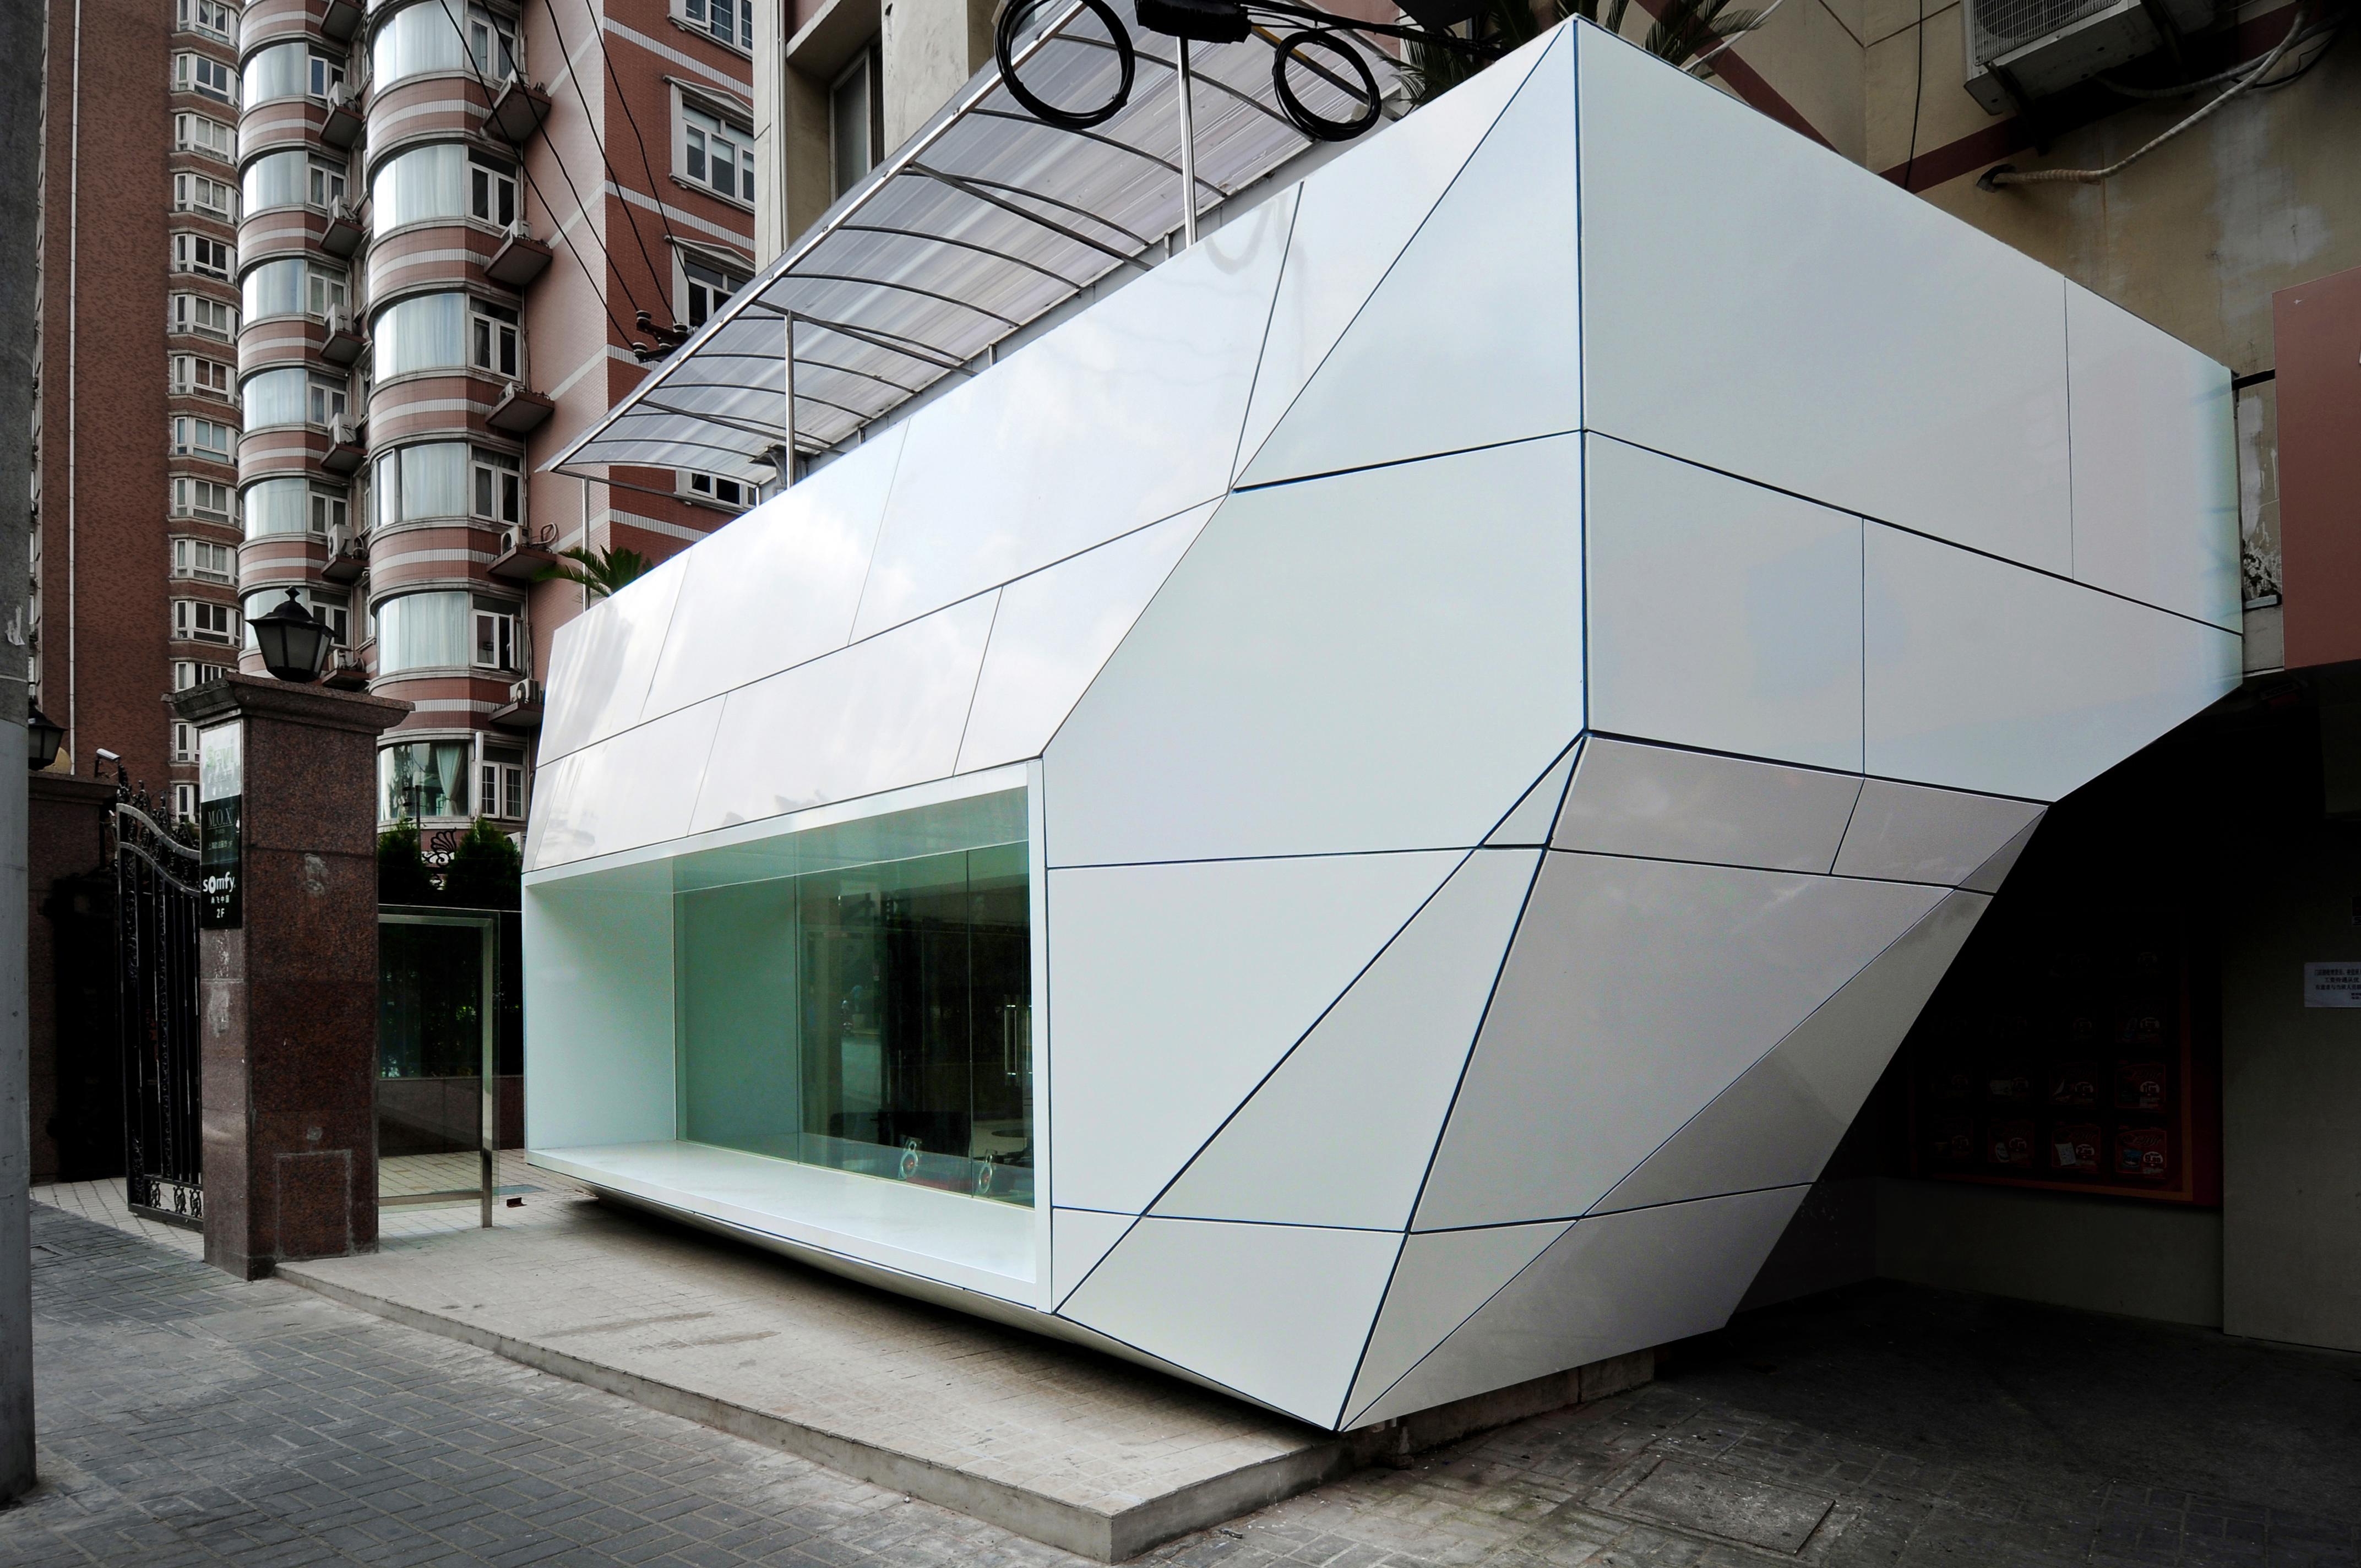 STUDIO BOX 001